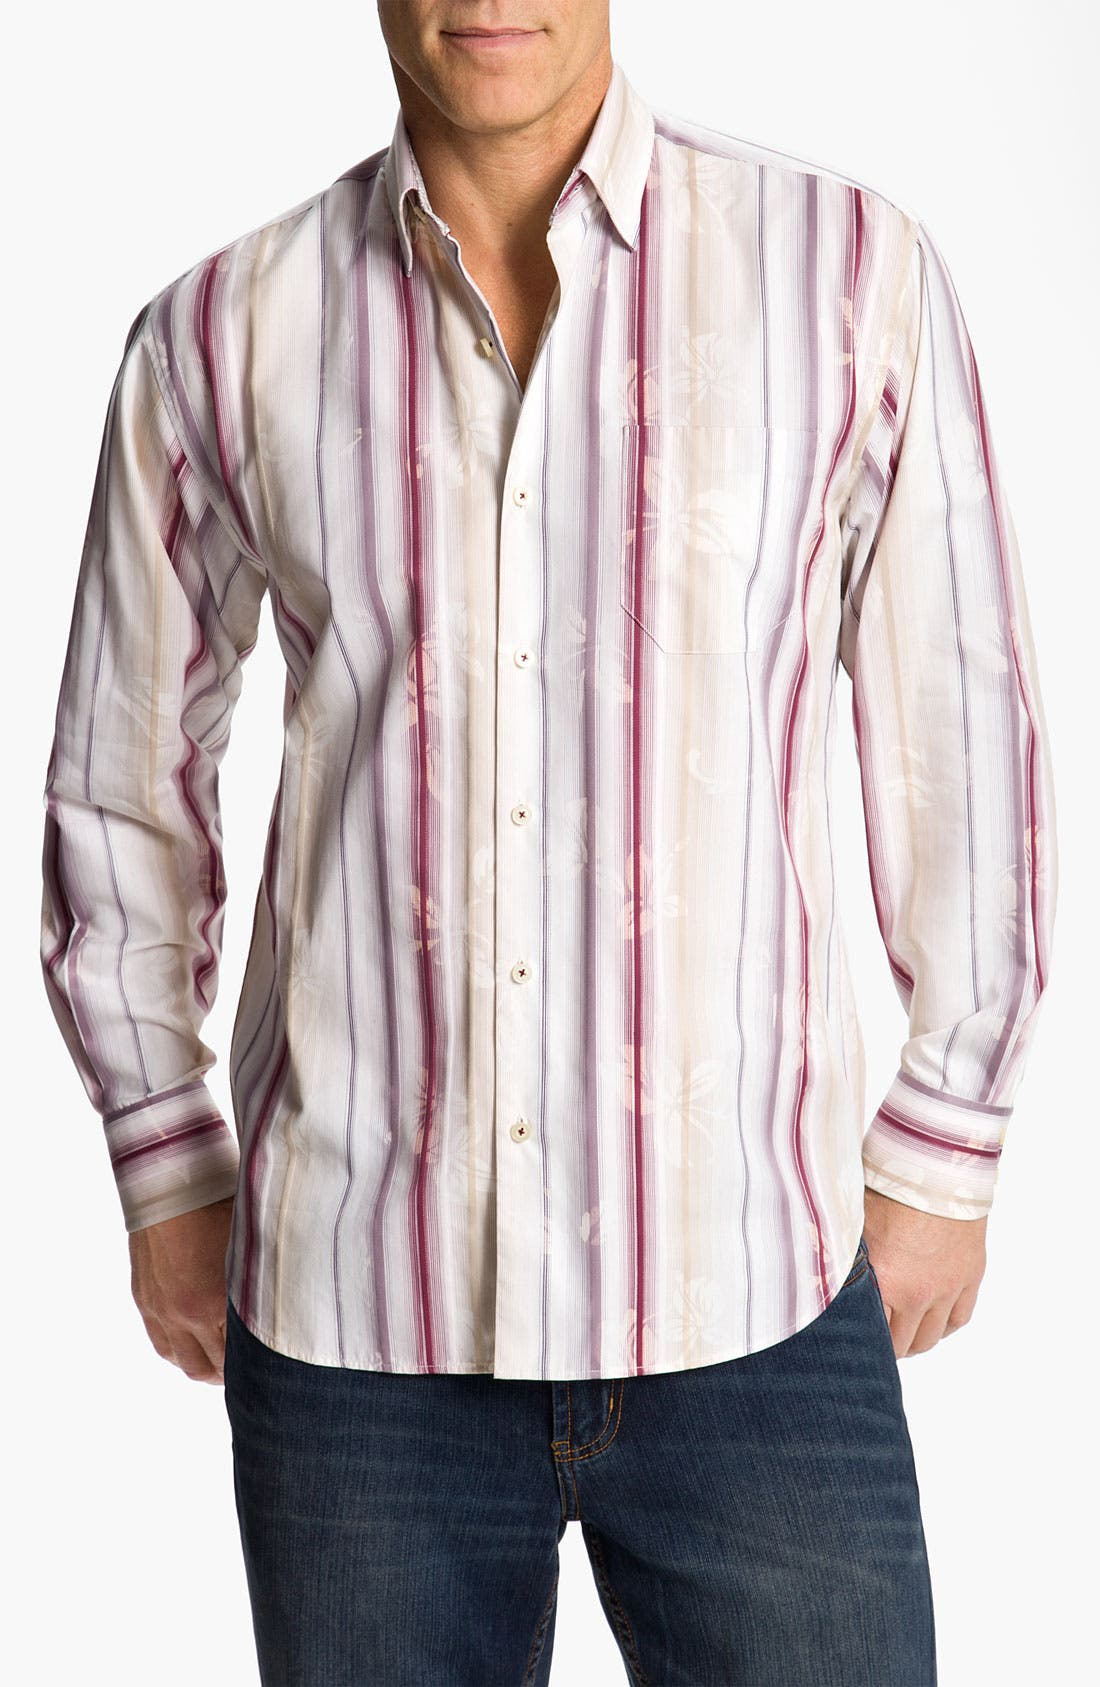 Alternate Image 1 Selected - Tommy Bahama 'Fleur de Soleil' Sport Shirt